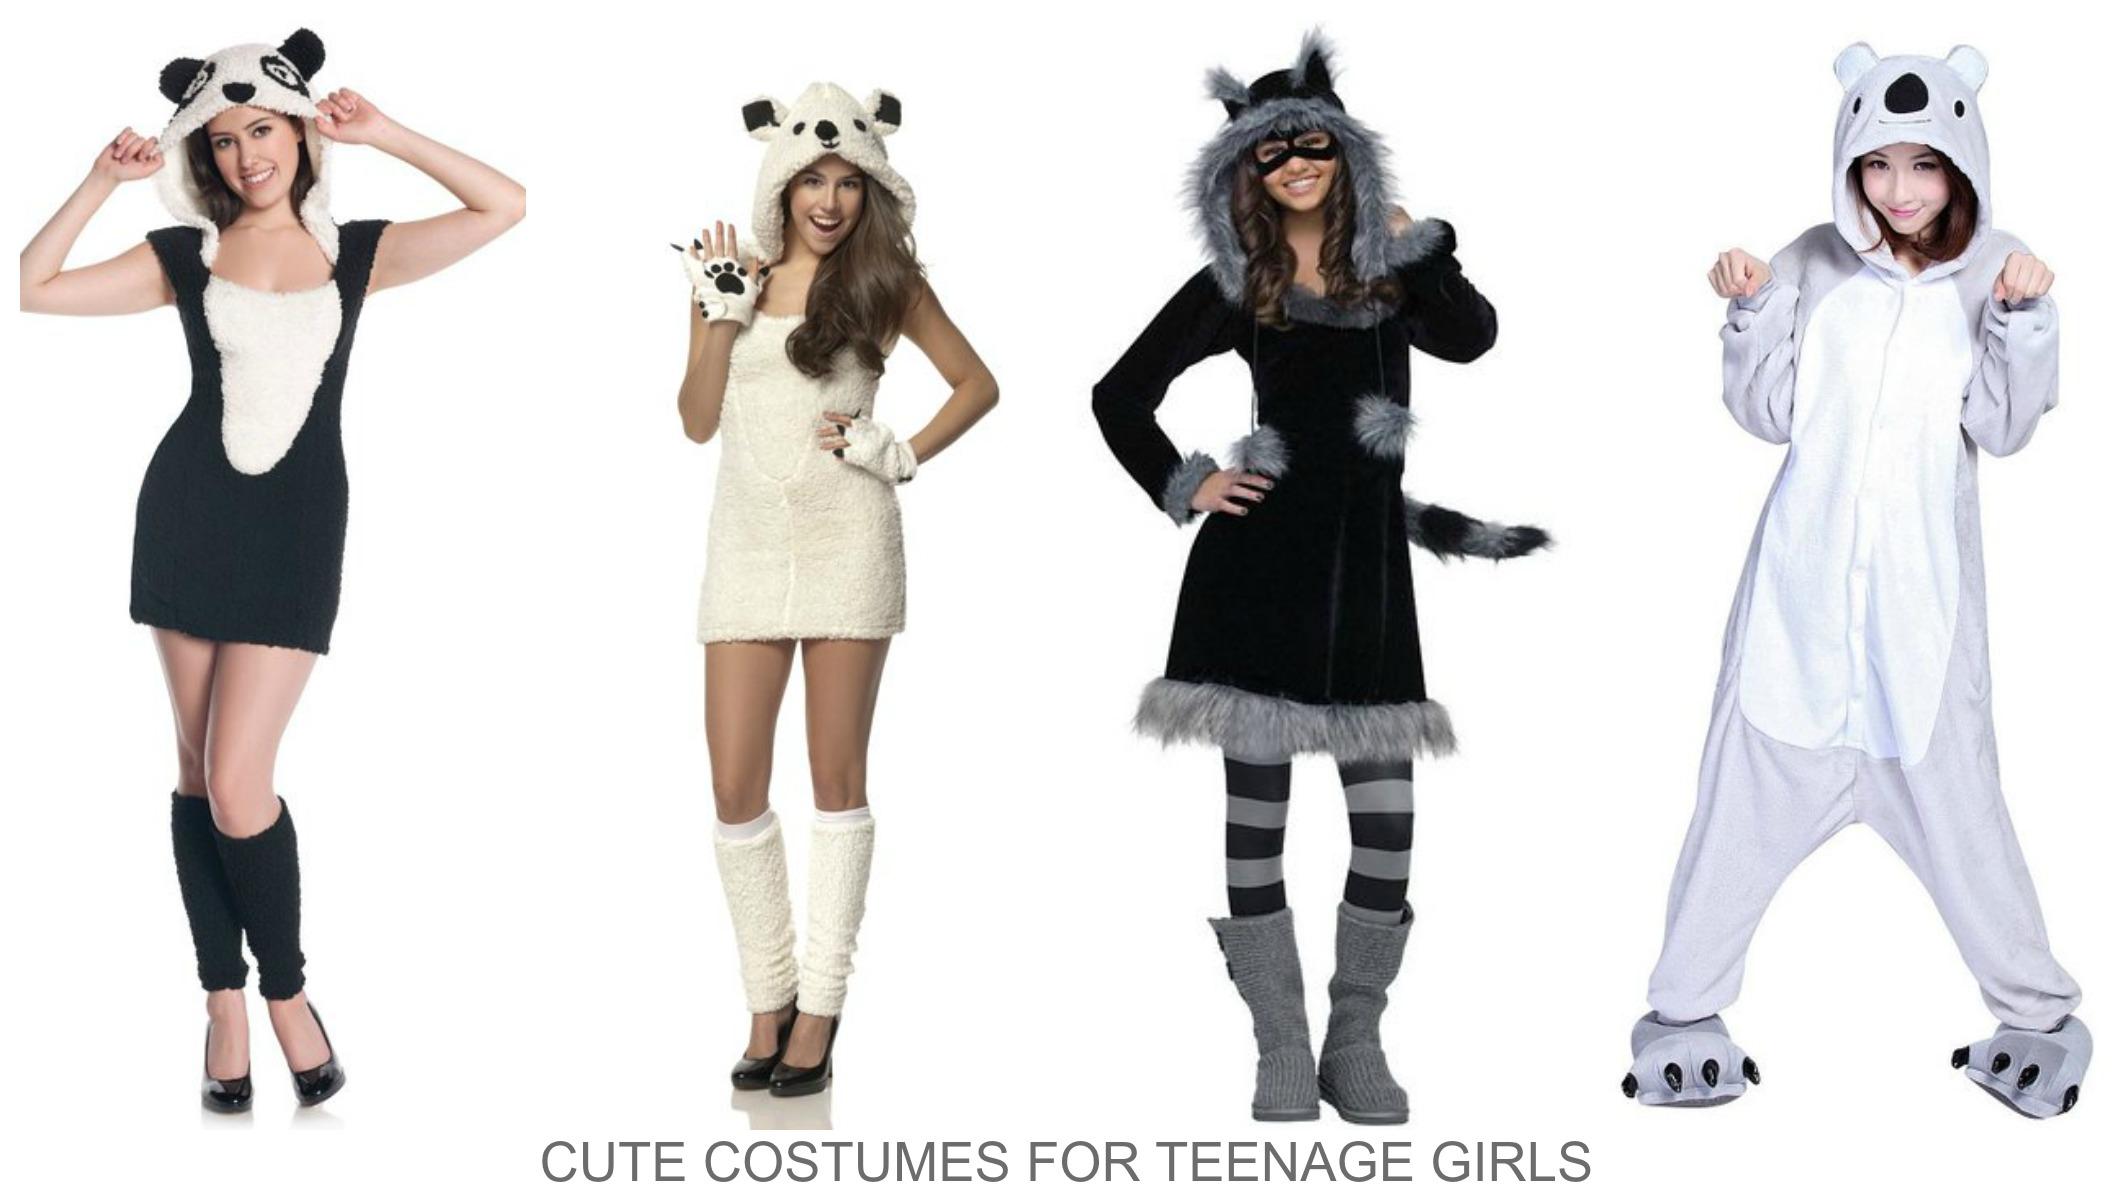 cute halloween costumes for women 2014, cute girl costume ideas